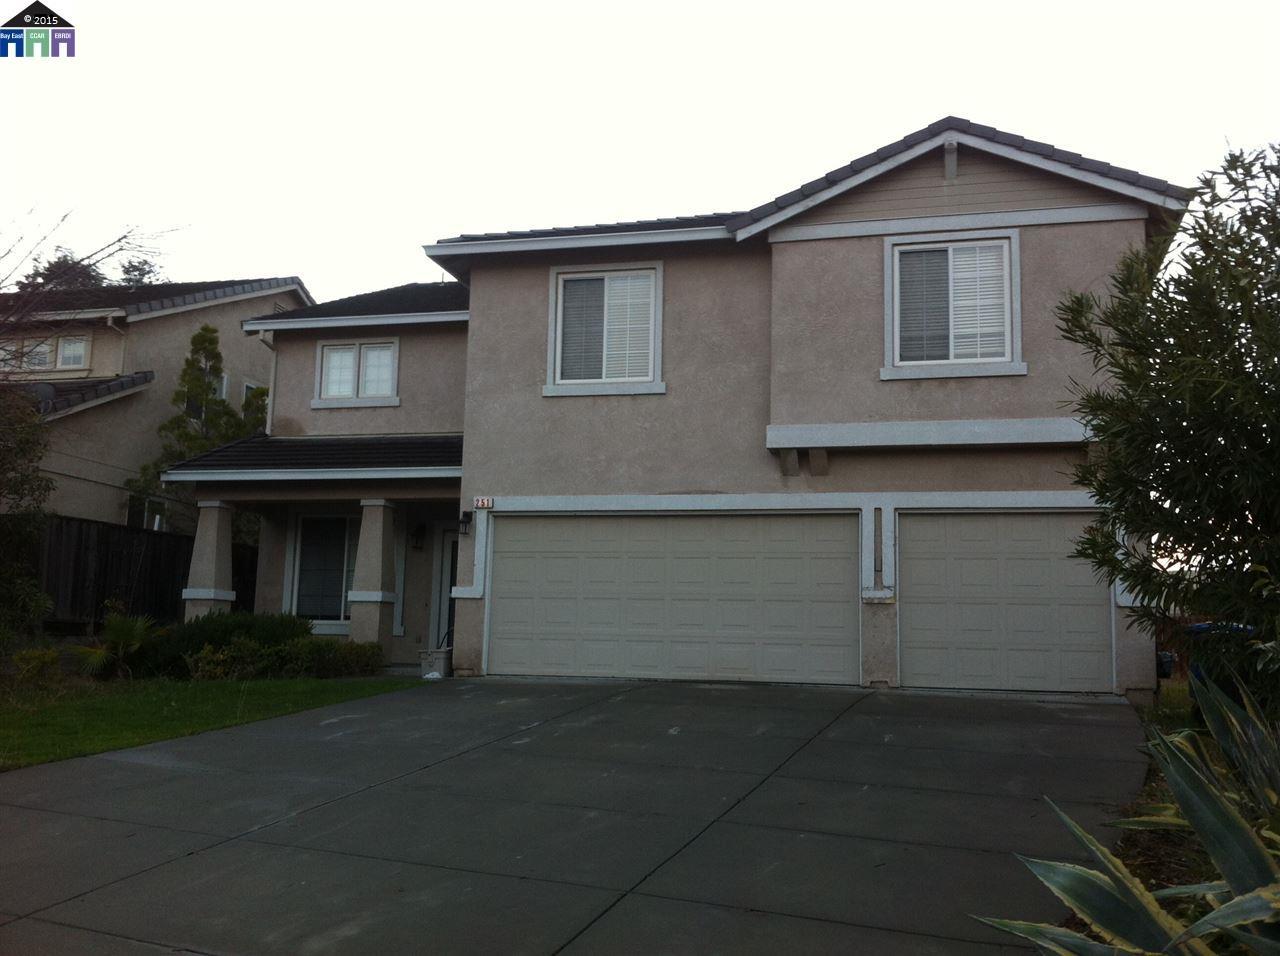 251 Cloverbrook Cir, Pittsburg, CA